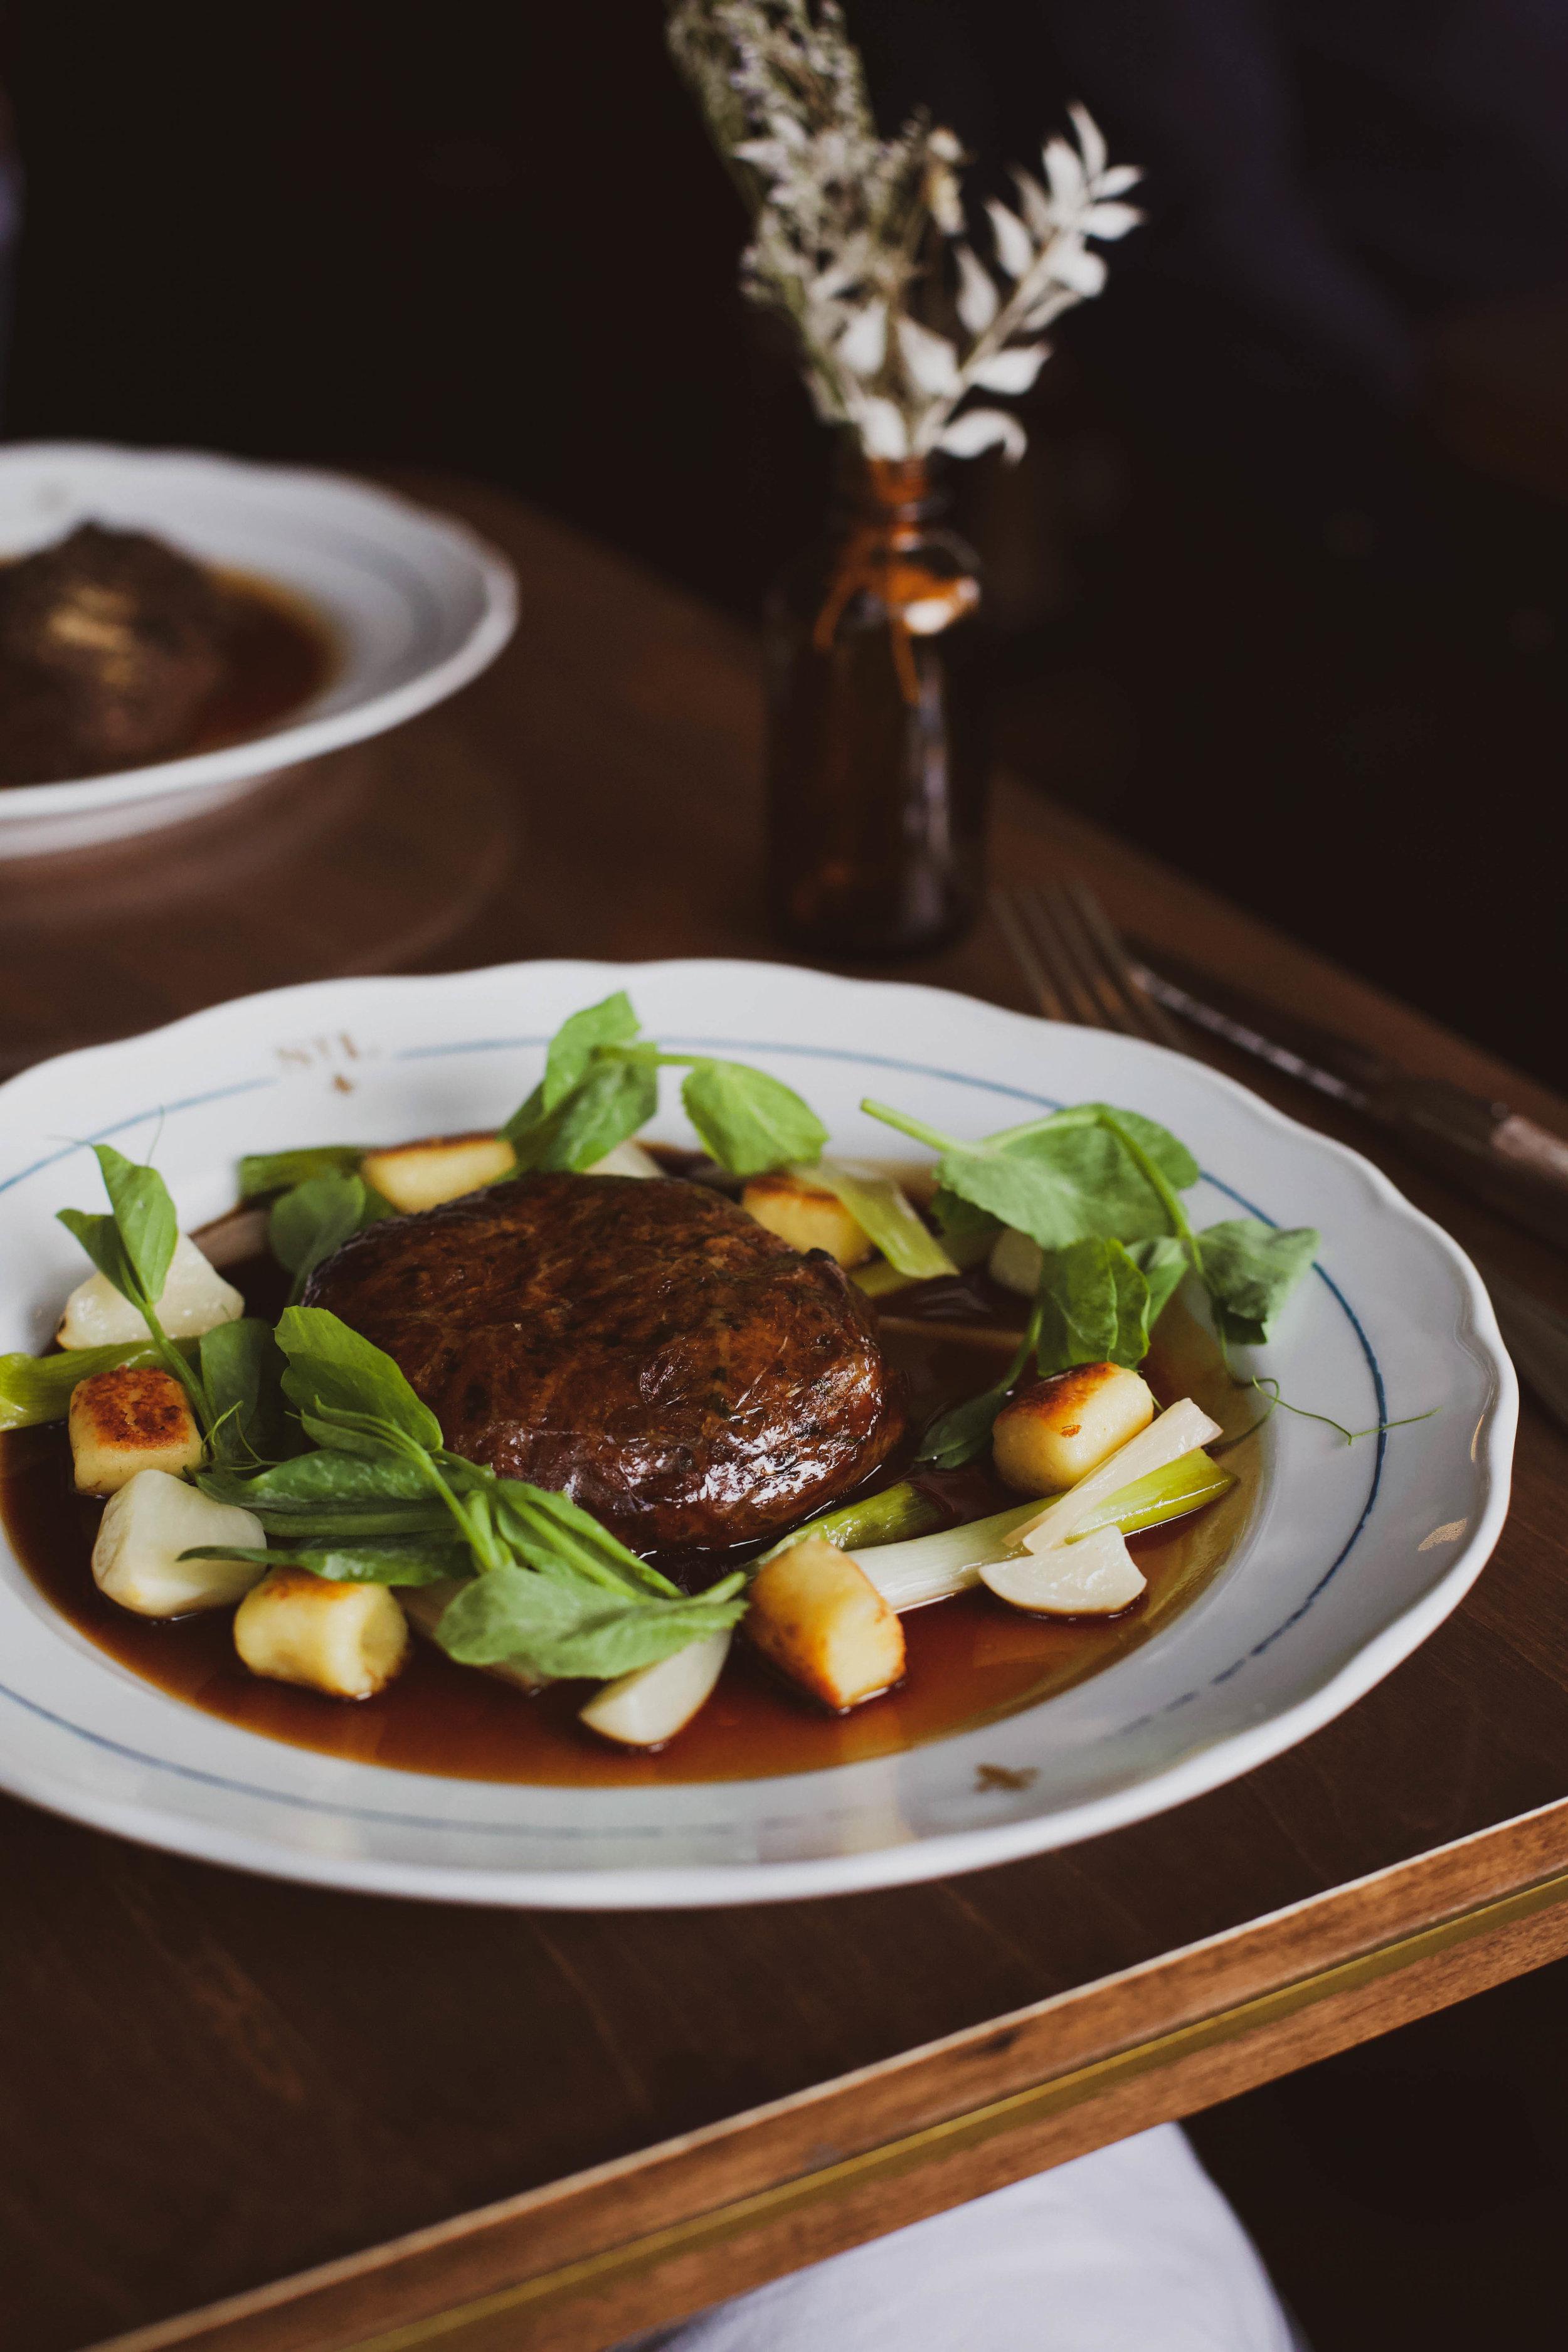 Braised lamb shoulder, Parisian gnocchi & summer greens